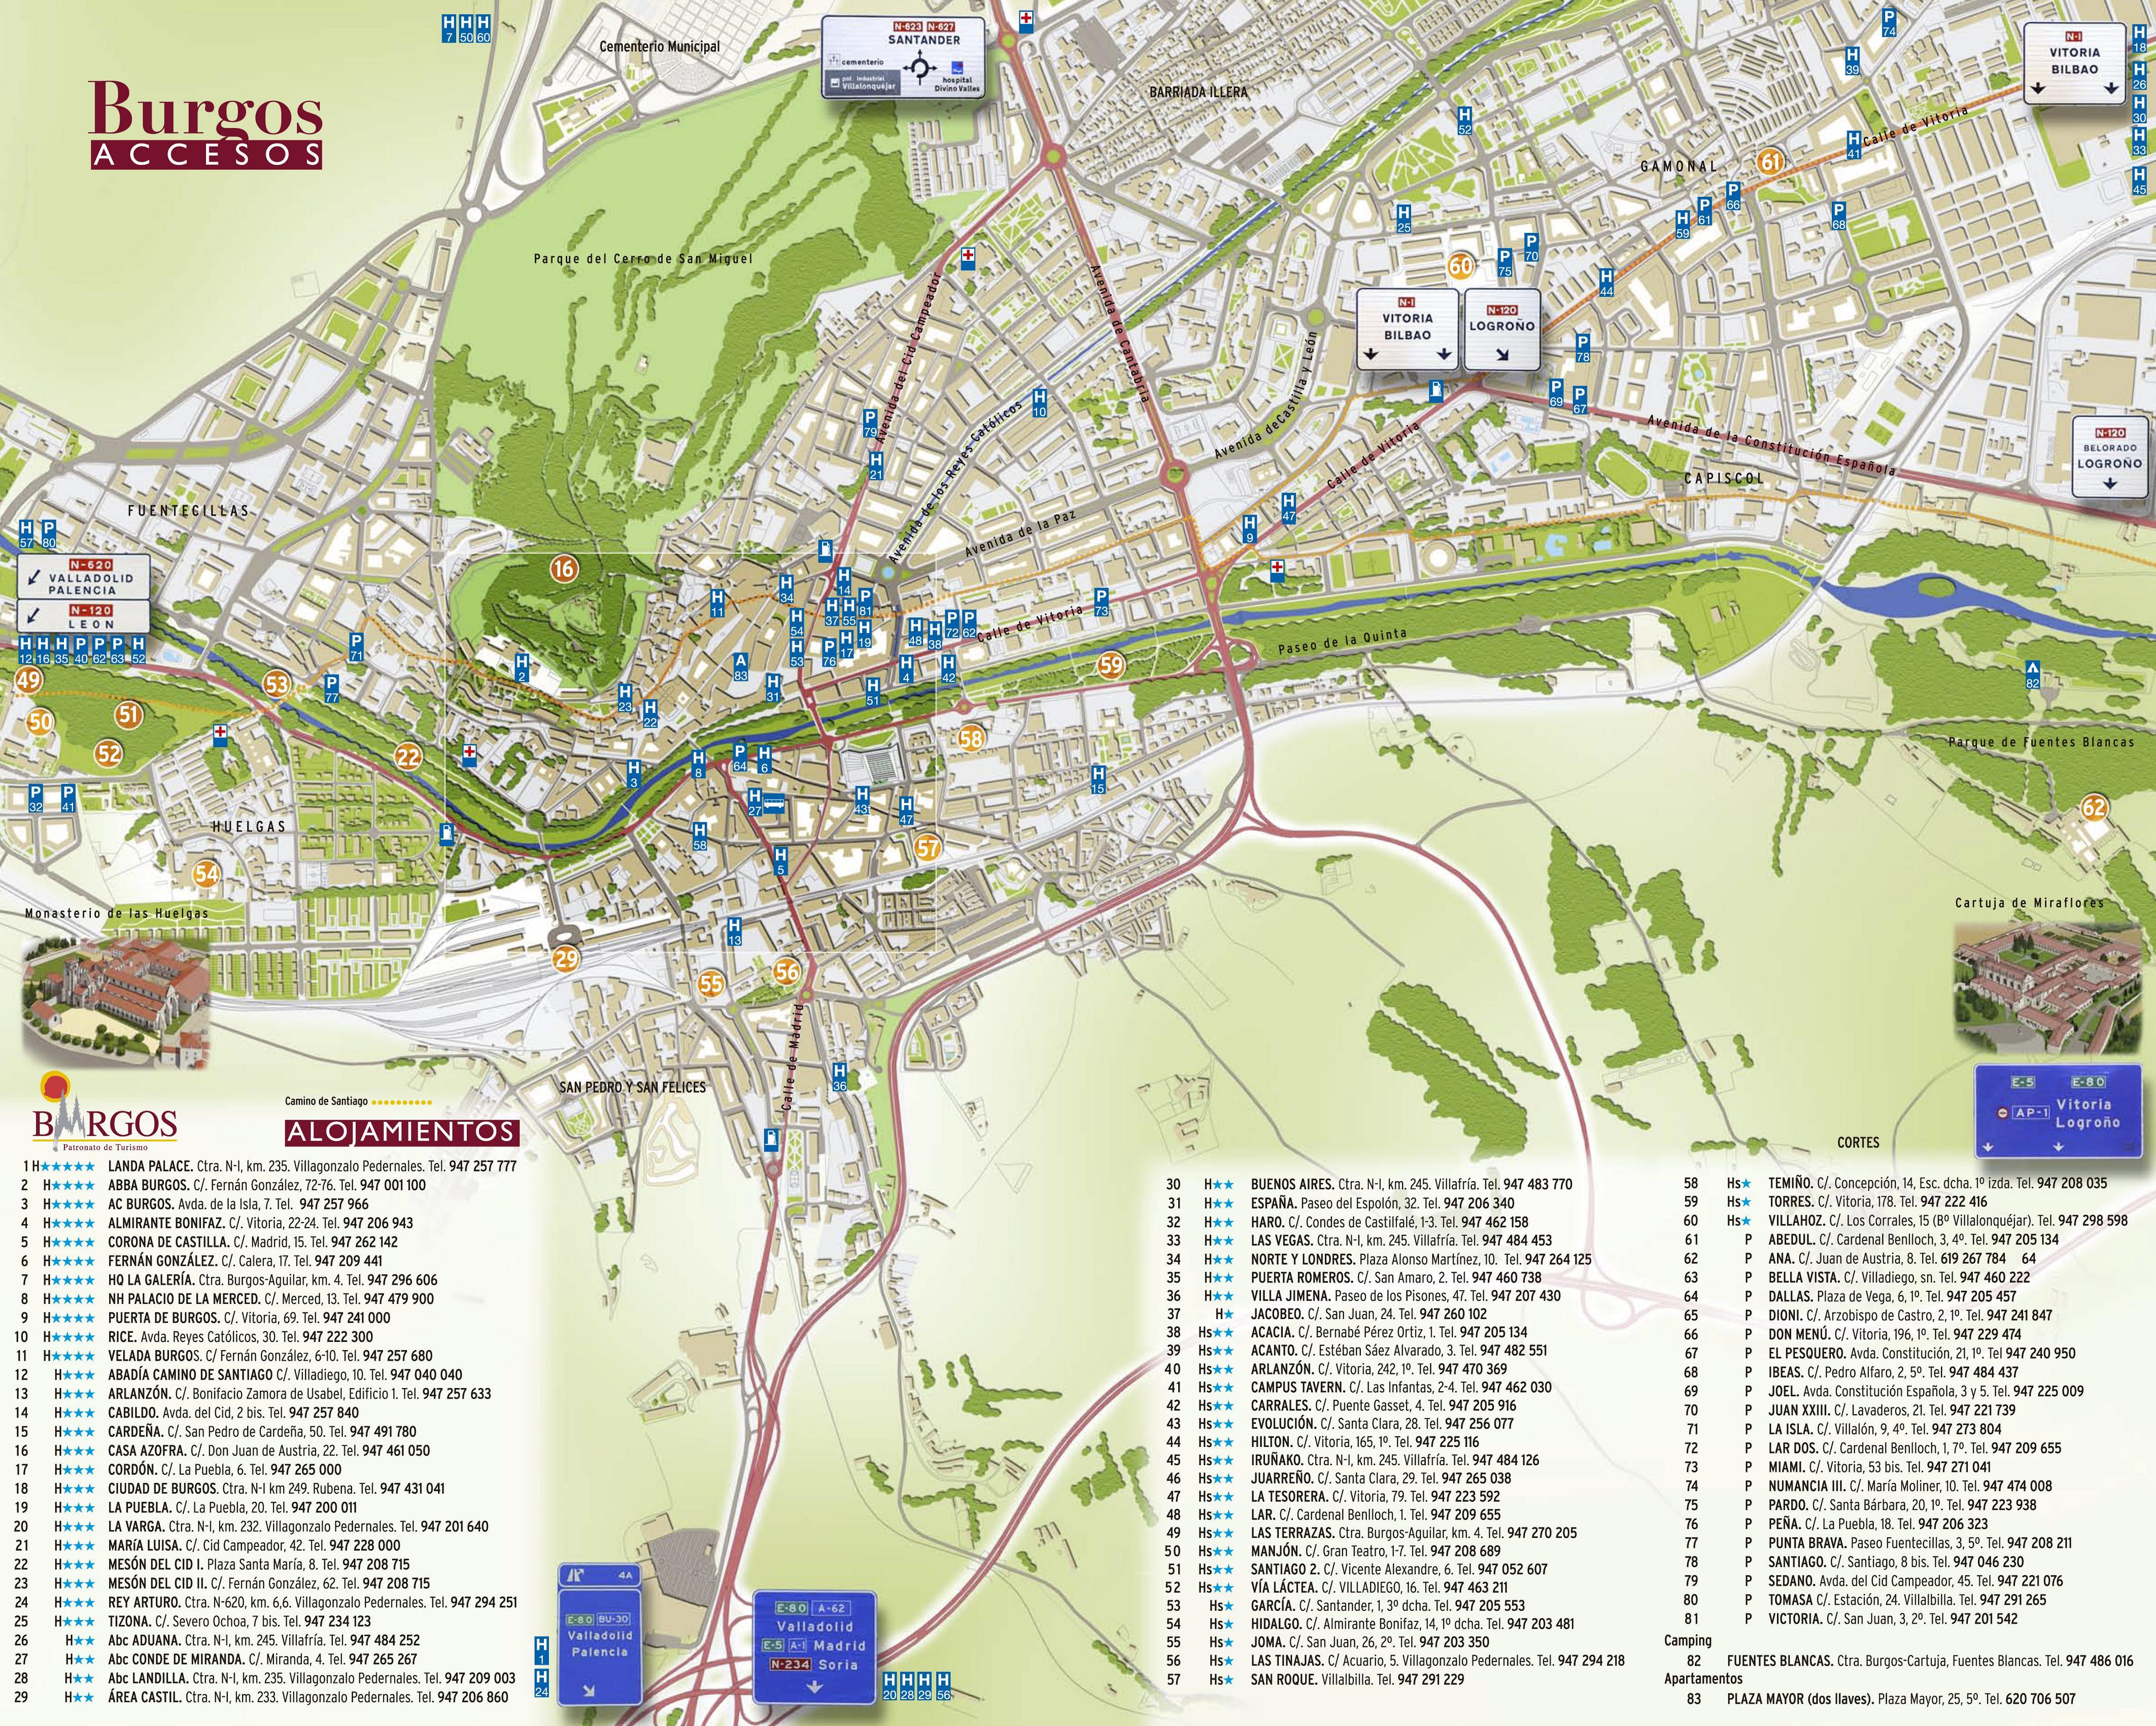 Map of Burgos 2008